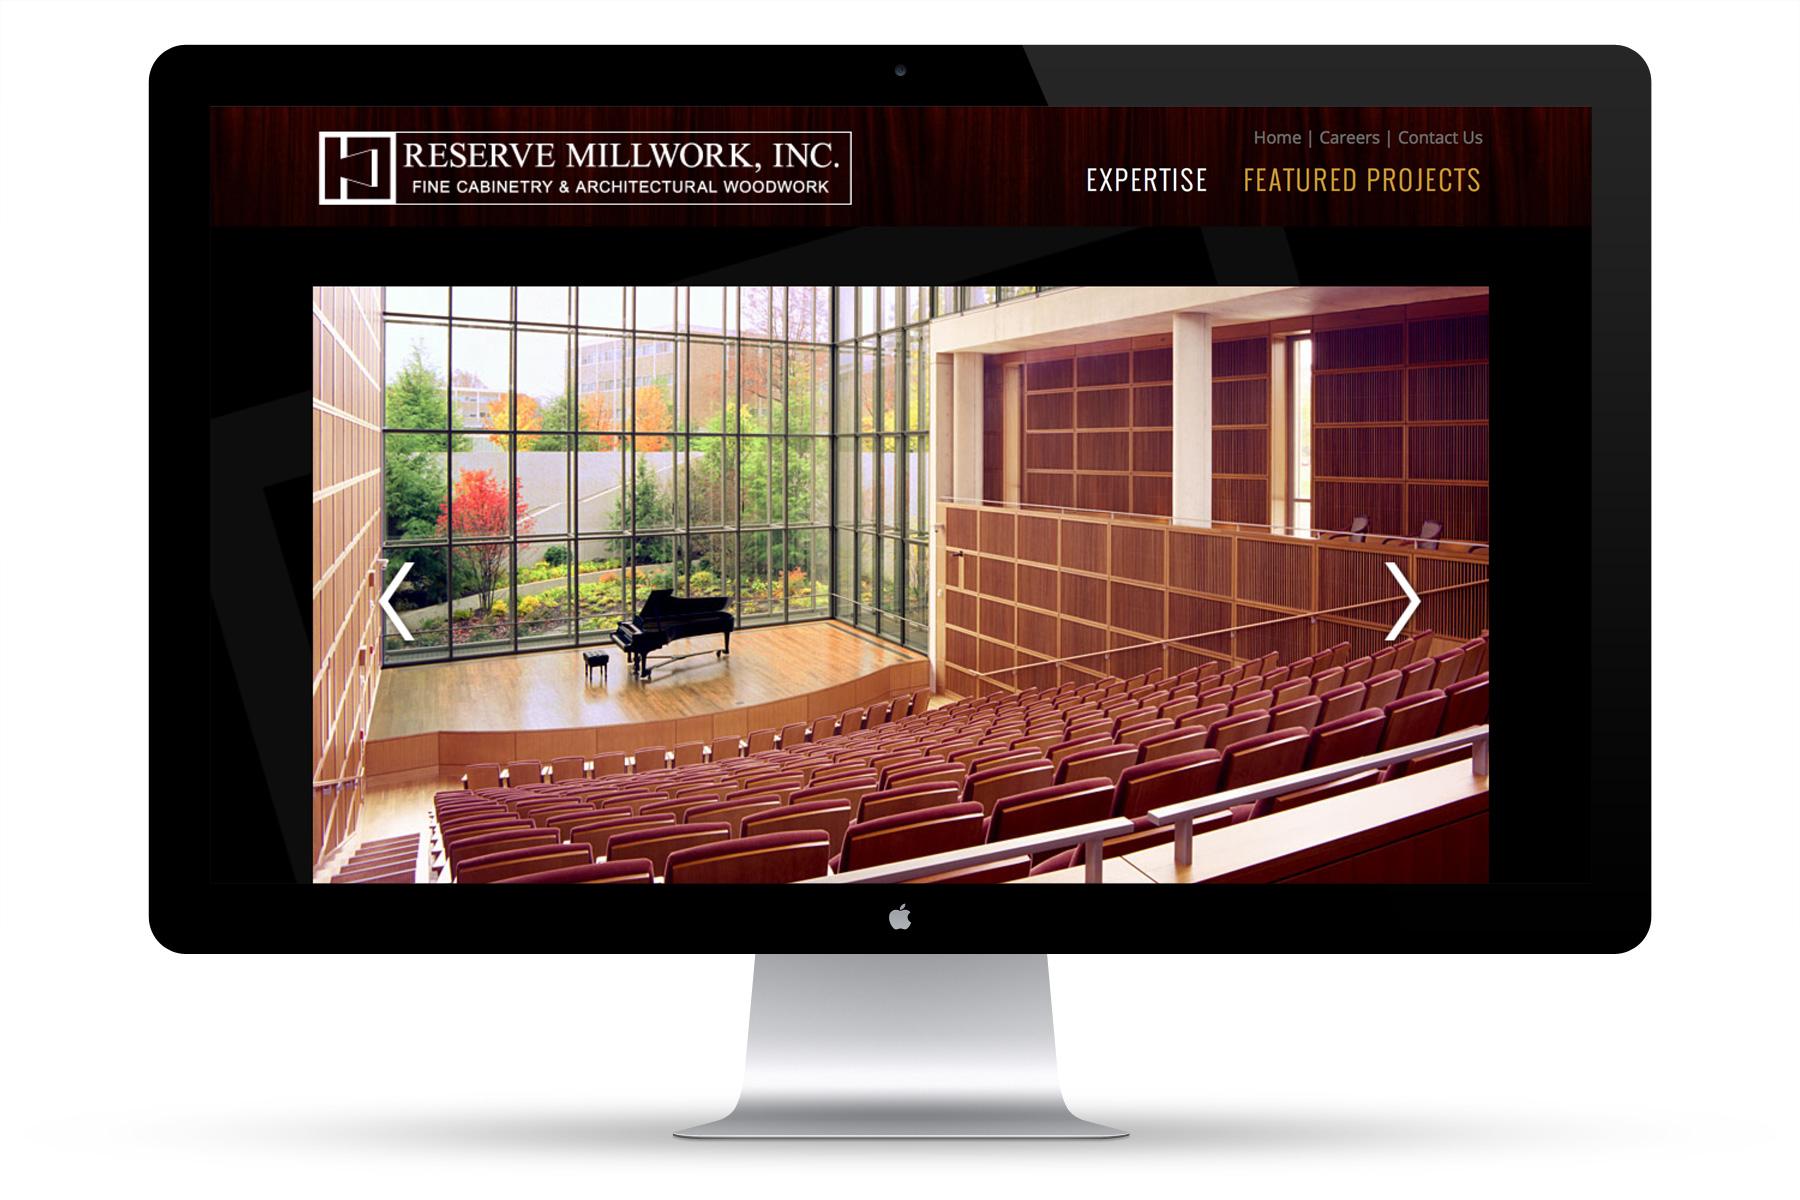 Reserve Millwork Web Design